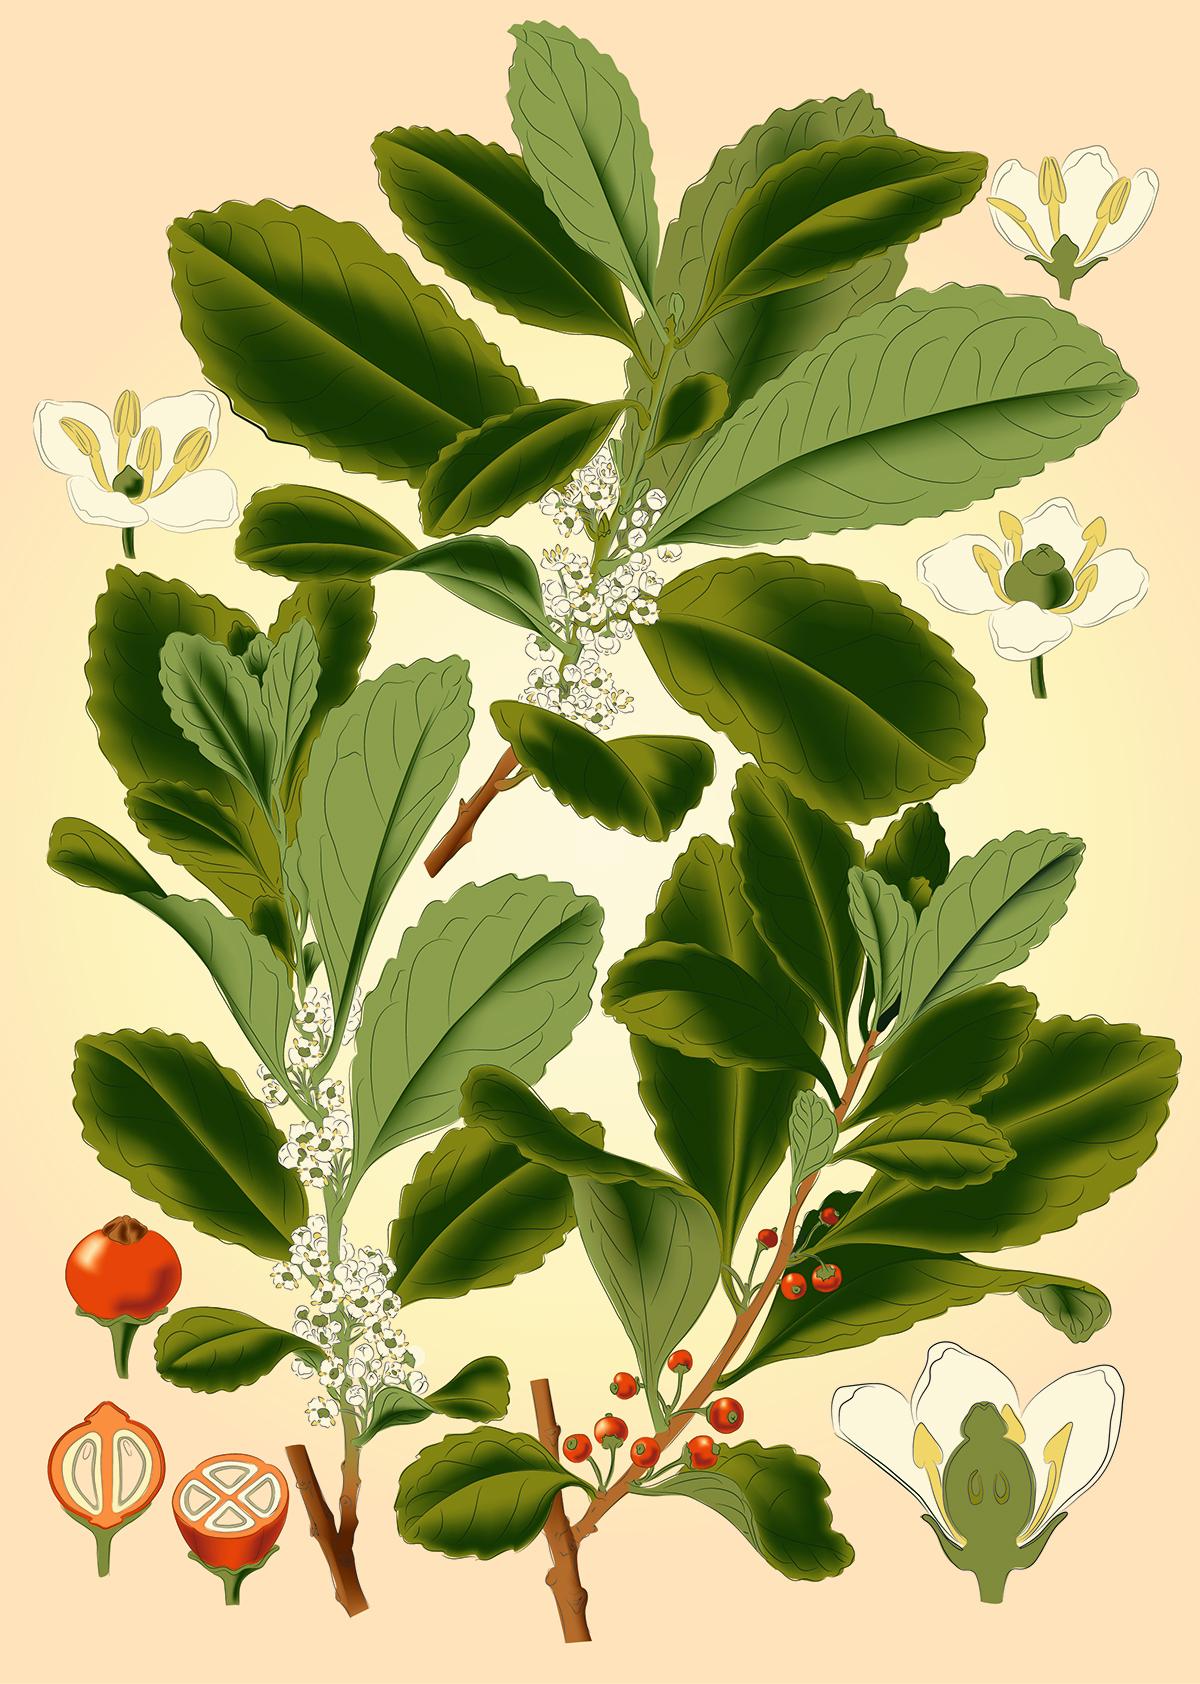 Botanik ILLUSTRATION  Illustrator Mate Strauch Plant pflanzen